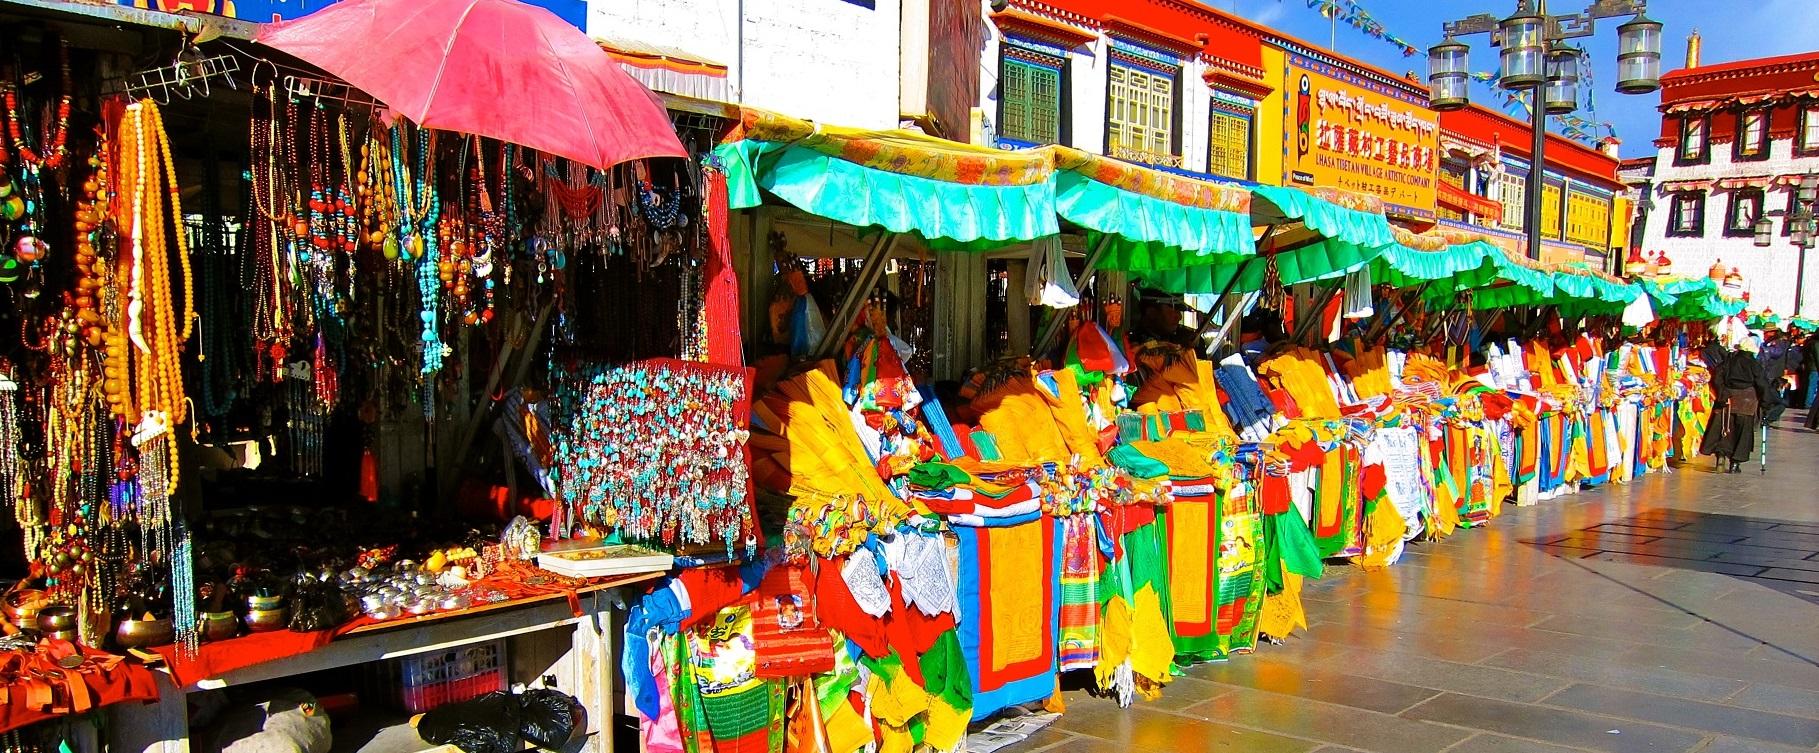 7Nts Manali Shimla Delhi With Agra